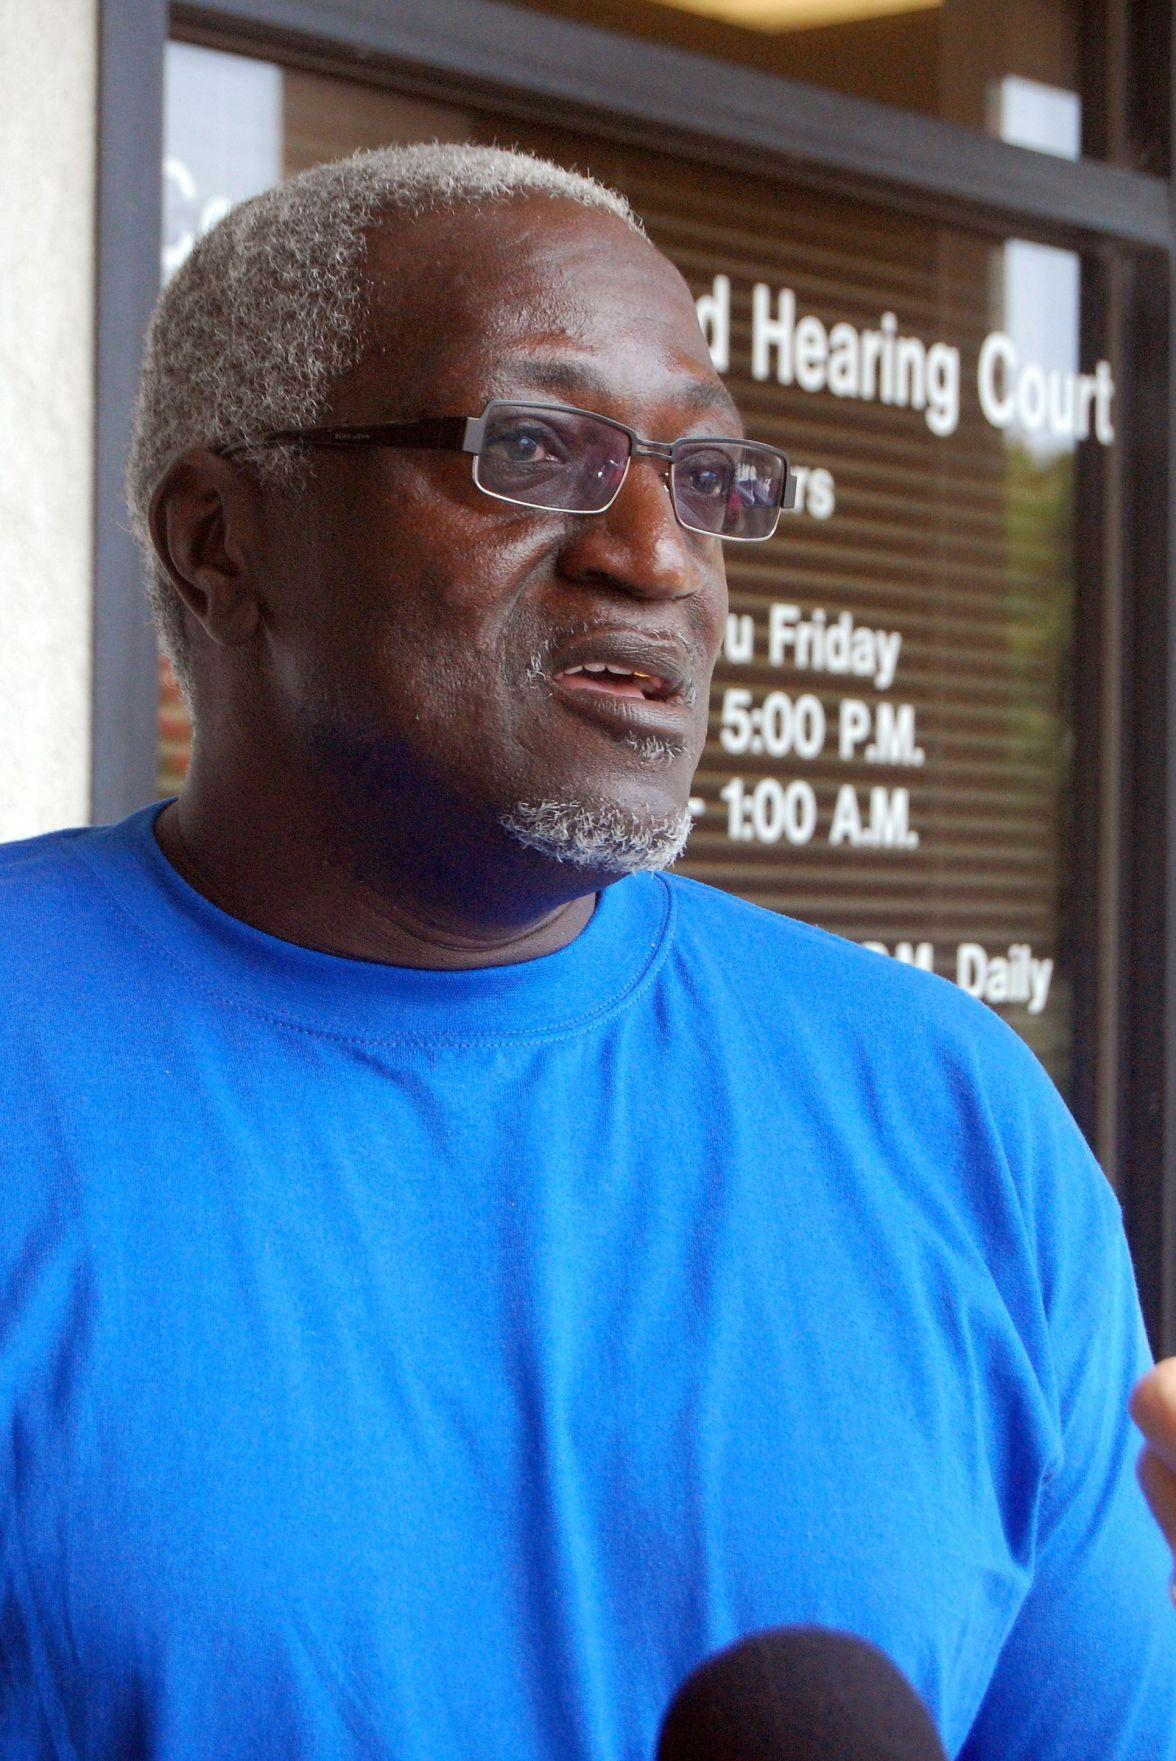 Affidavit: Feud preceded killing